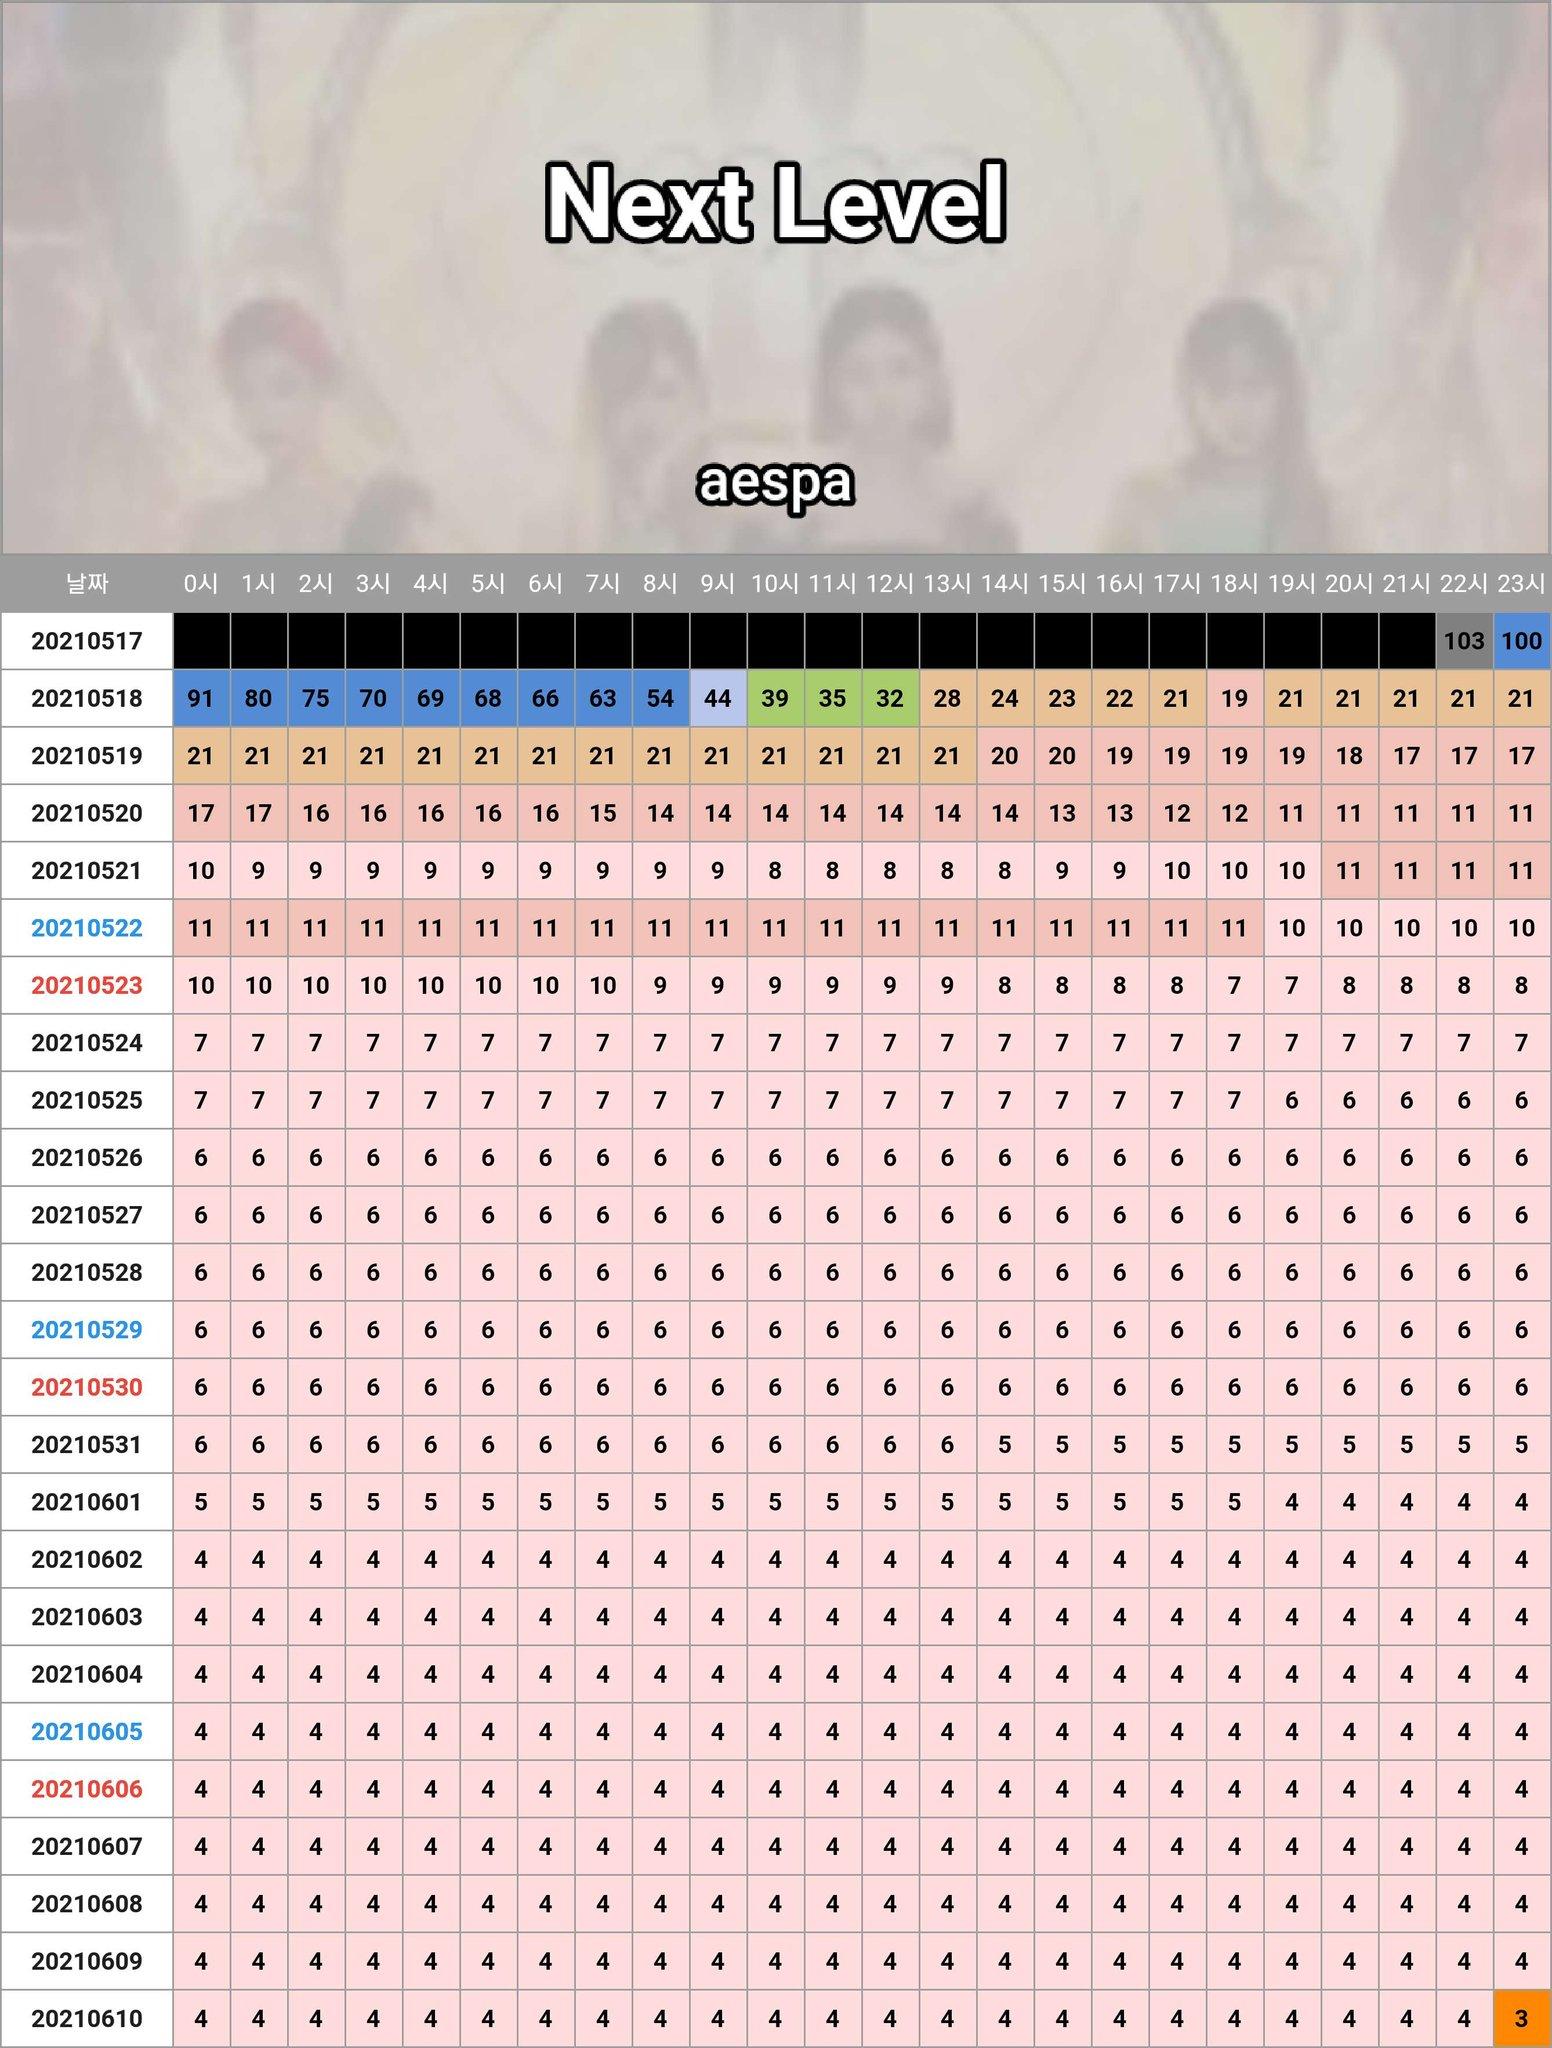 E3hvx5aVIAQ63PQ?format=jpg&name=large